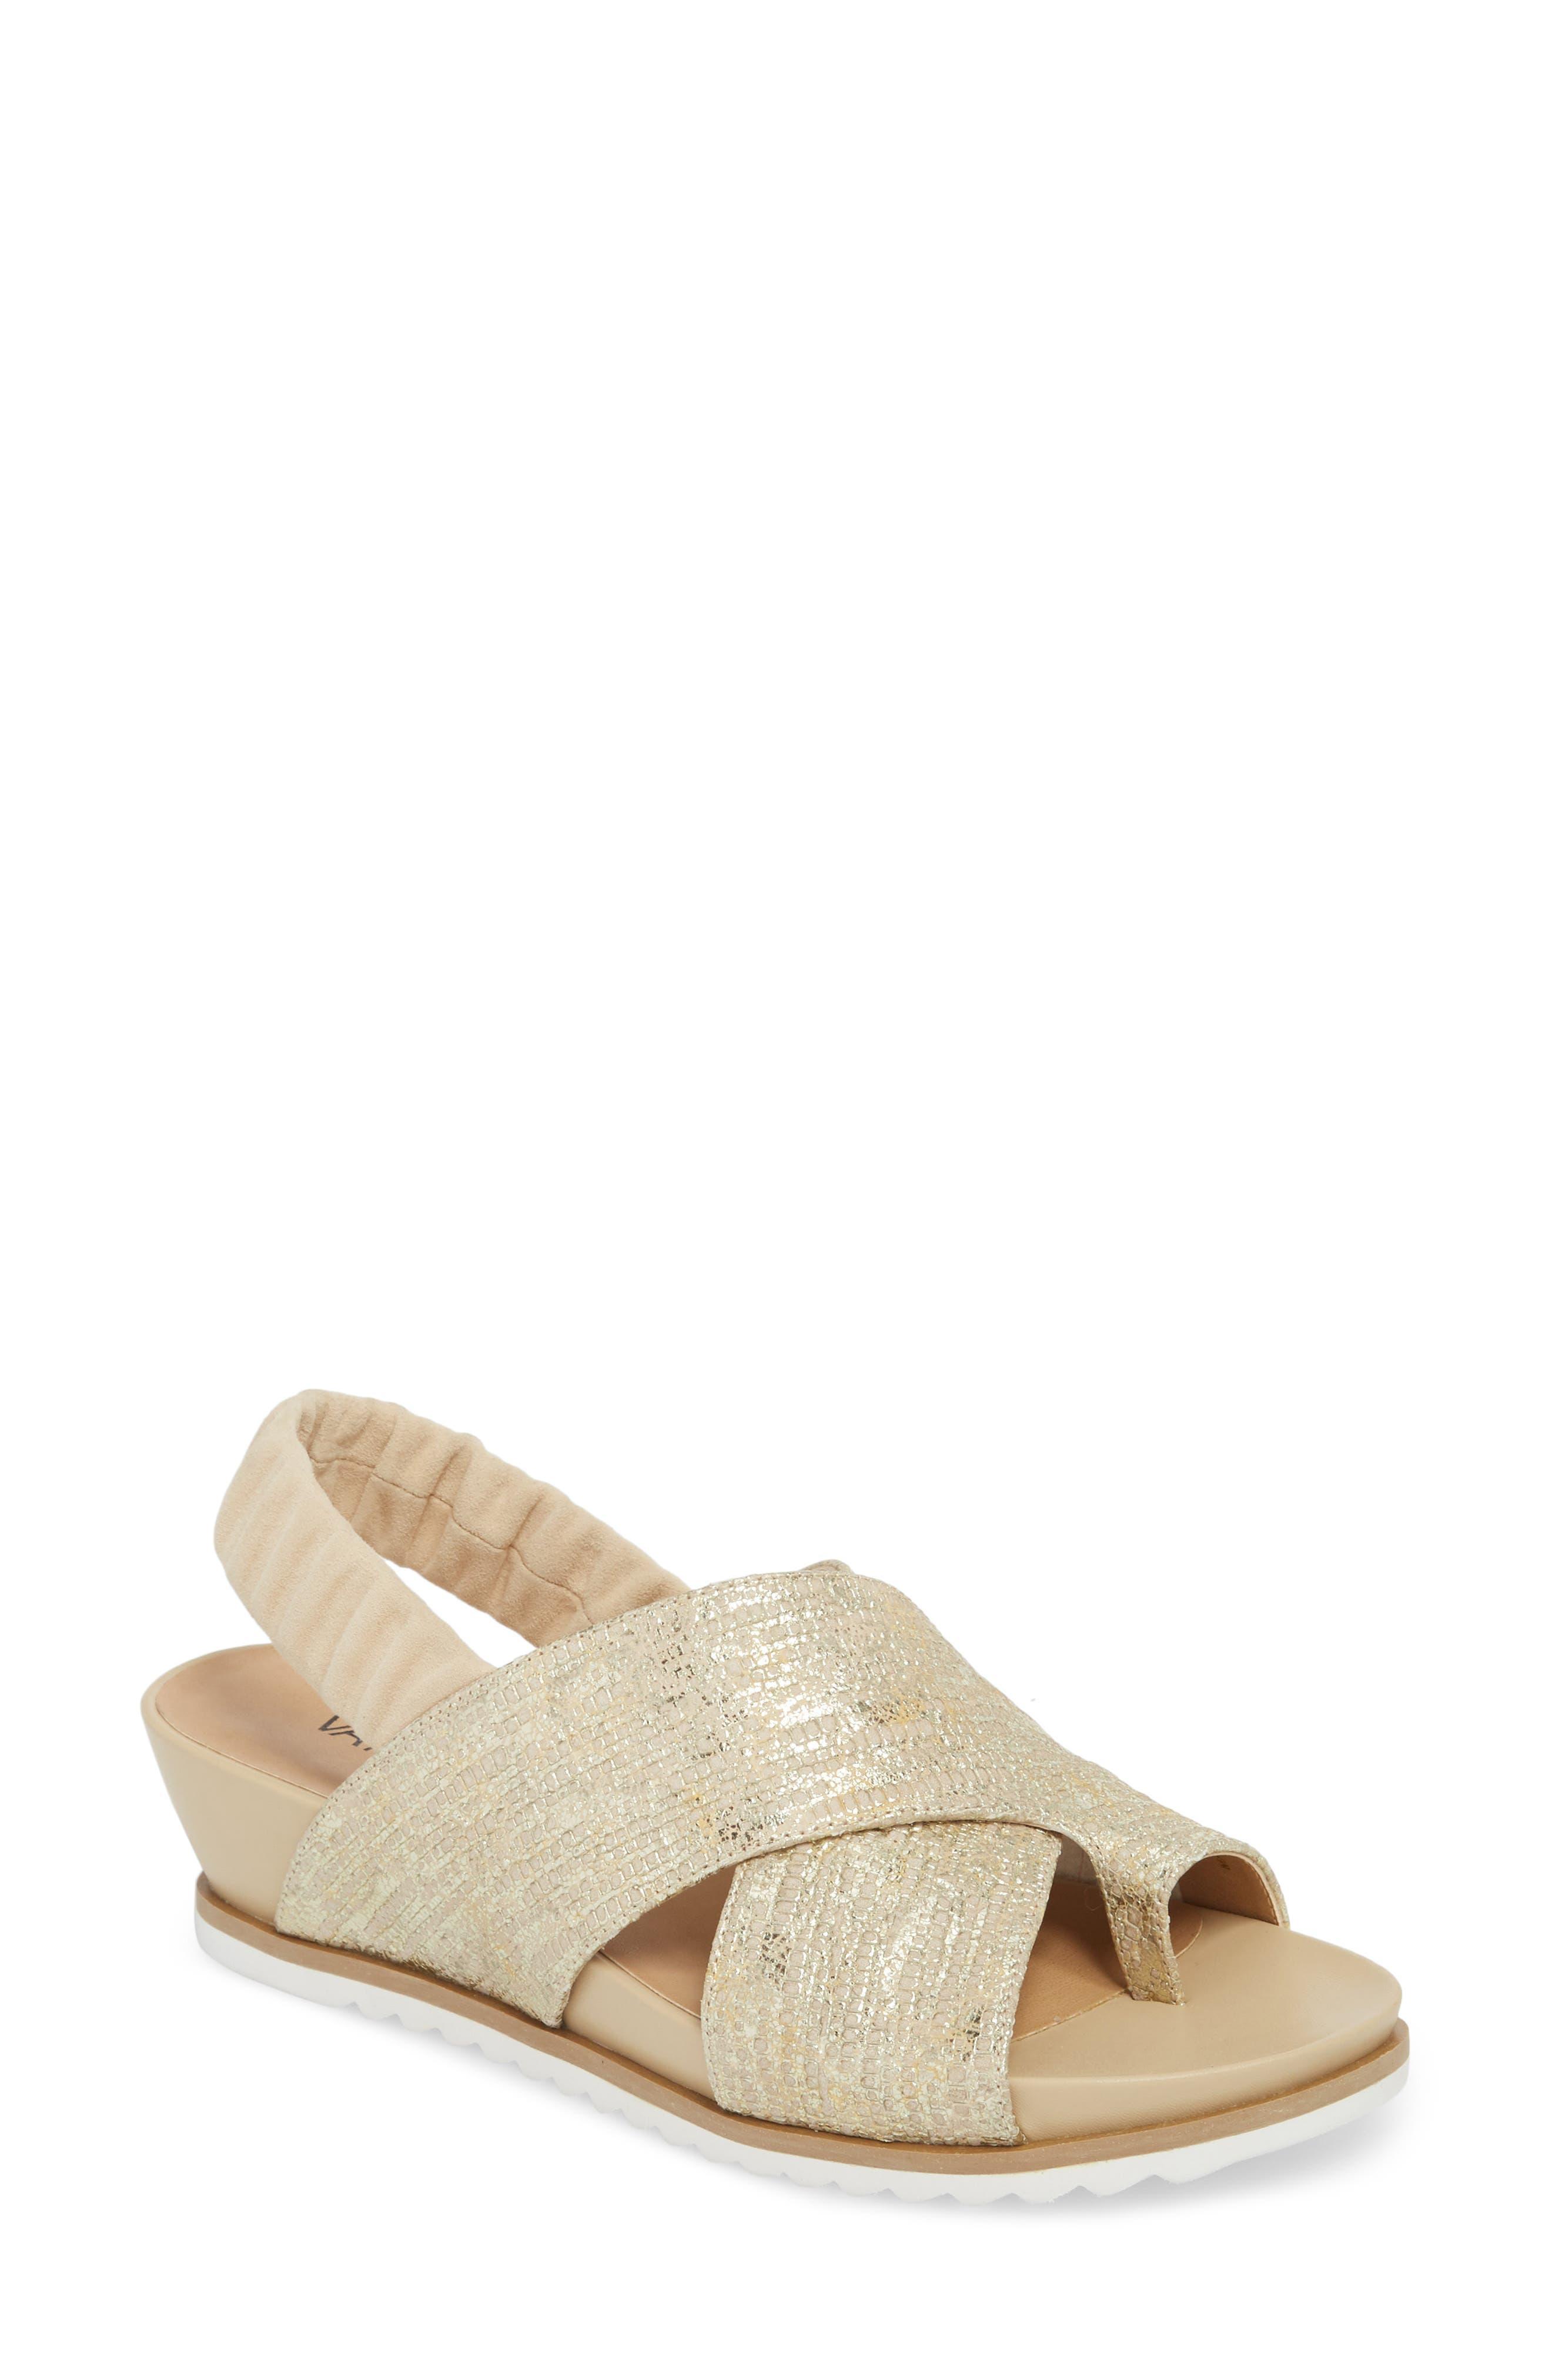 Hendra Slingback Sandal,                             Main thumbnail 3, color,